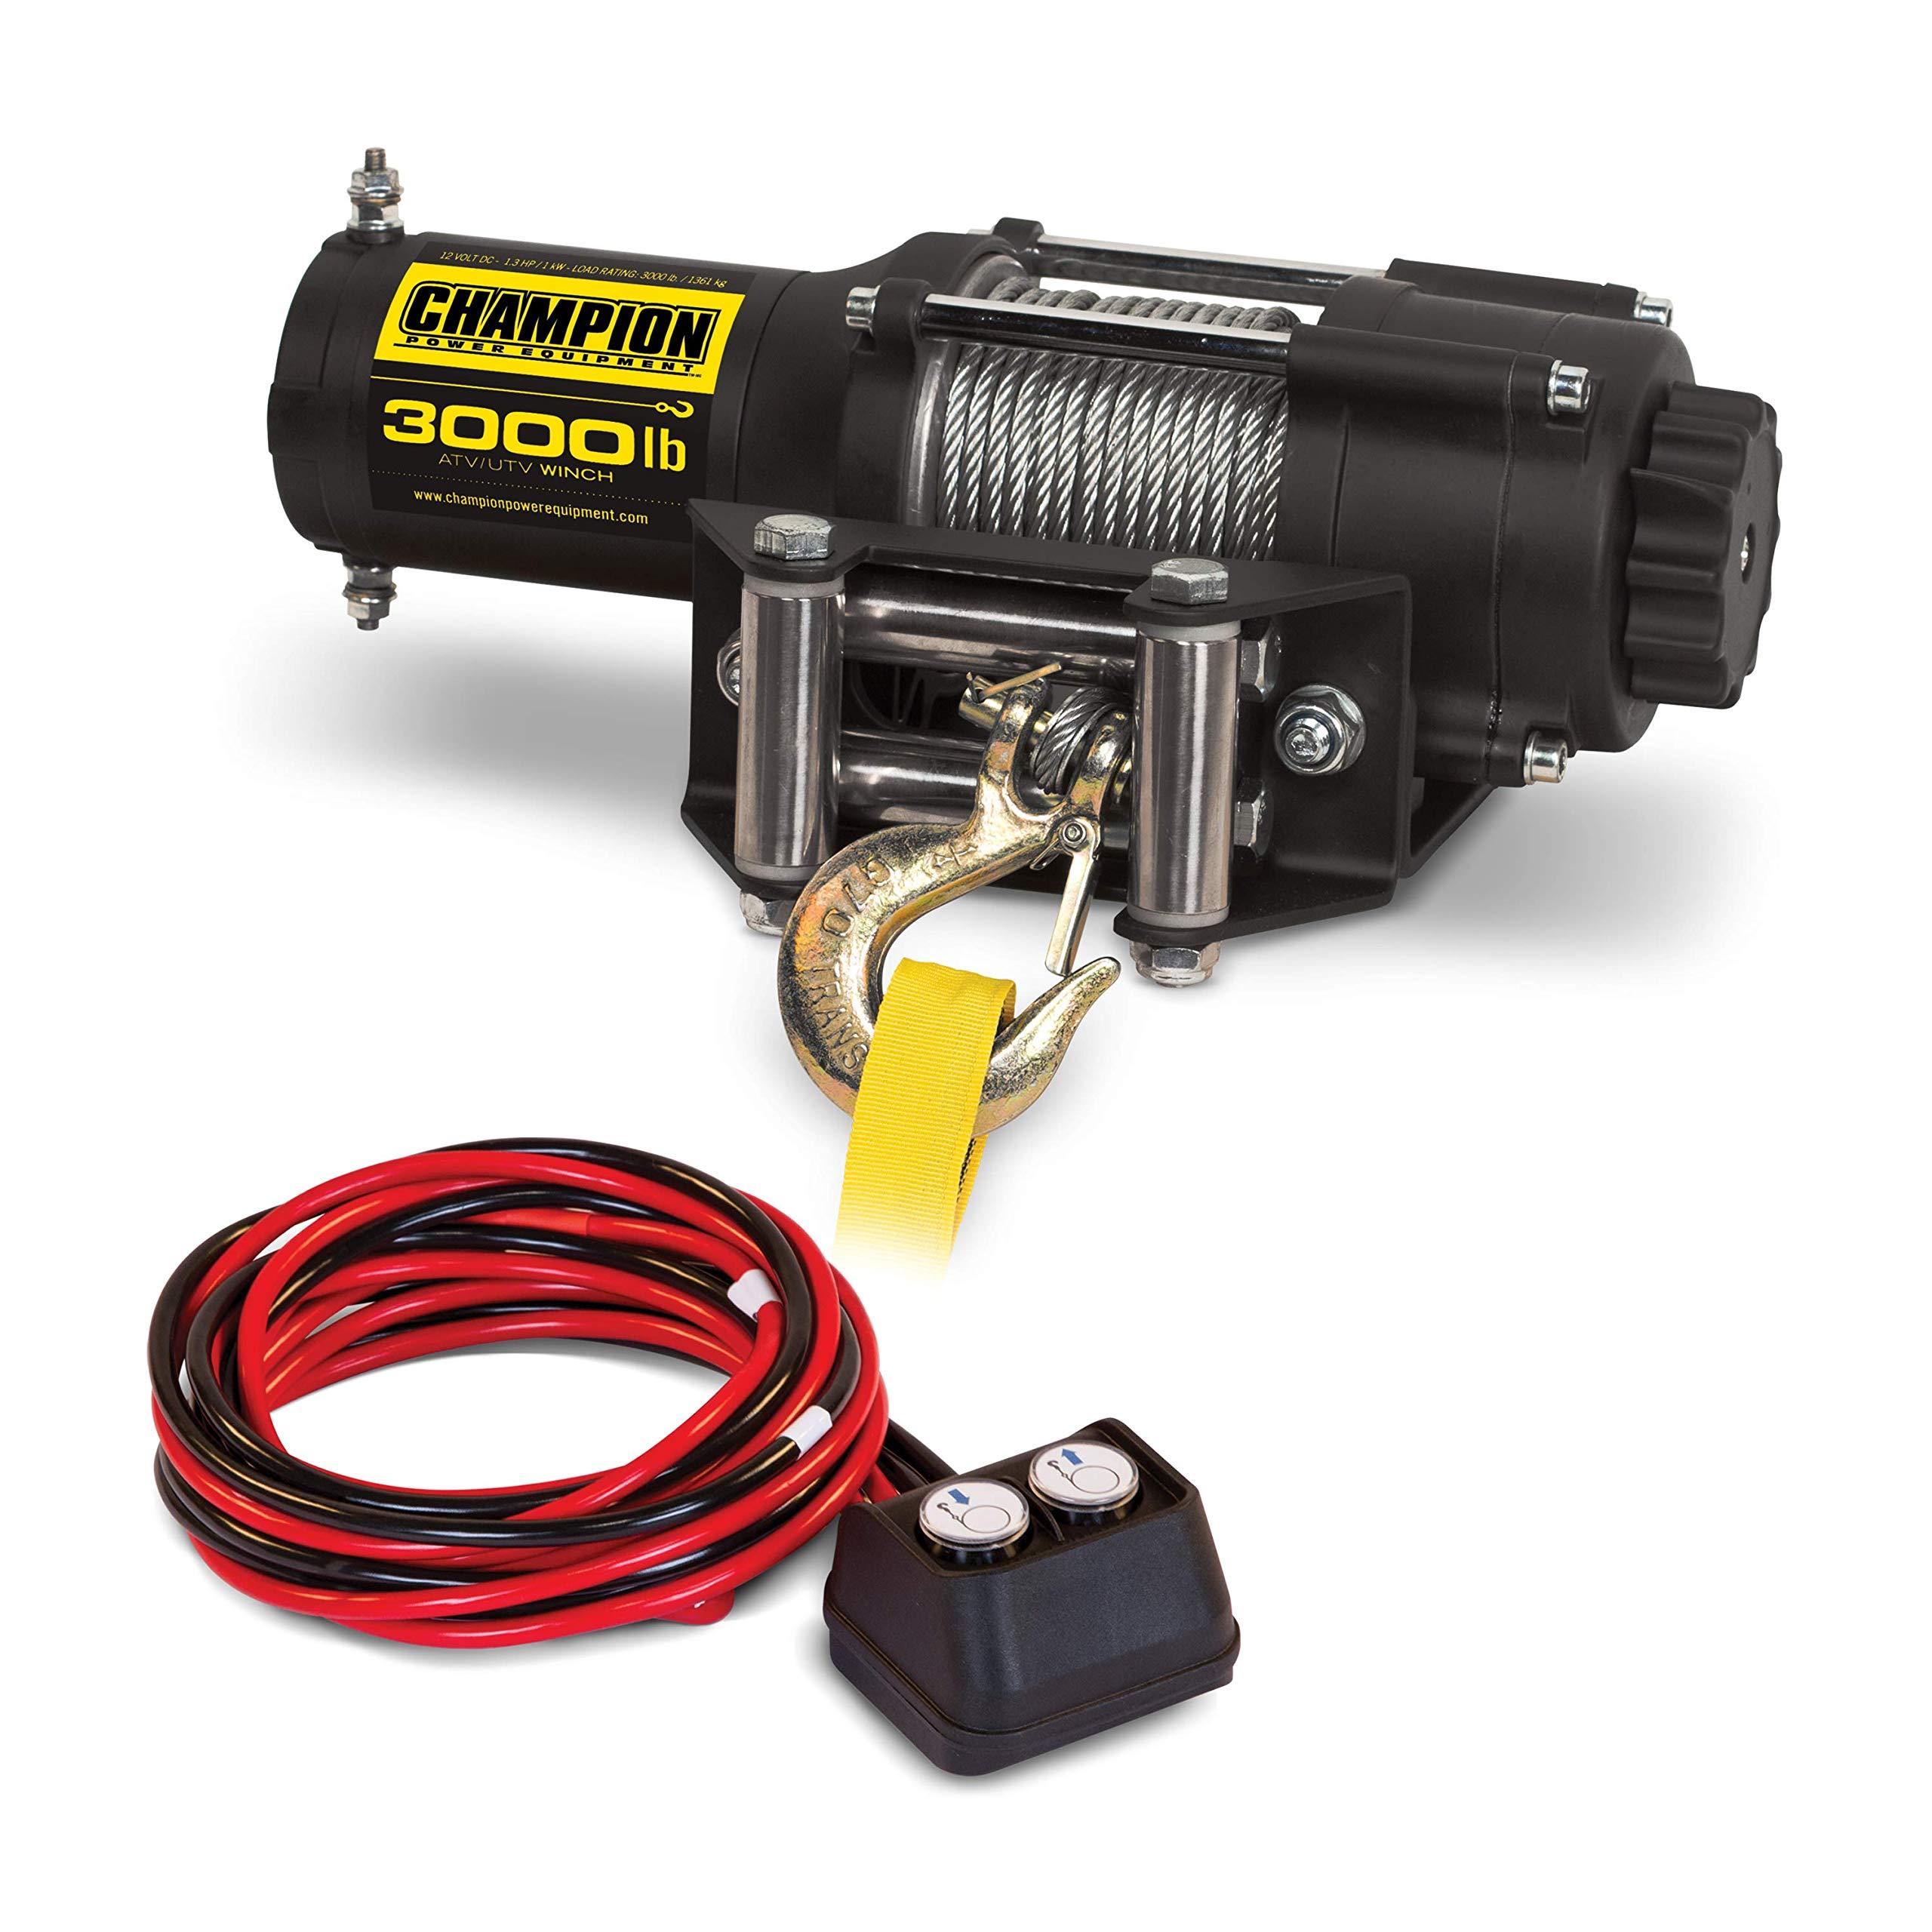 Champion 3000-lb. ATV/UTV Winch Kit by Champion Power Equipment